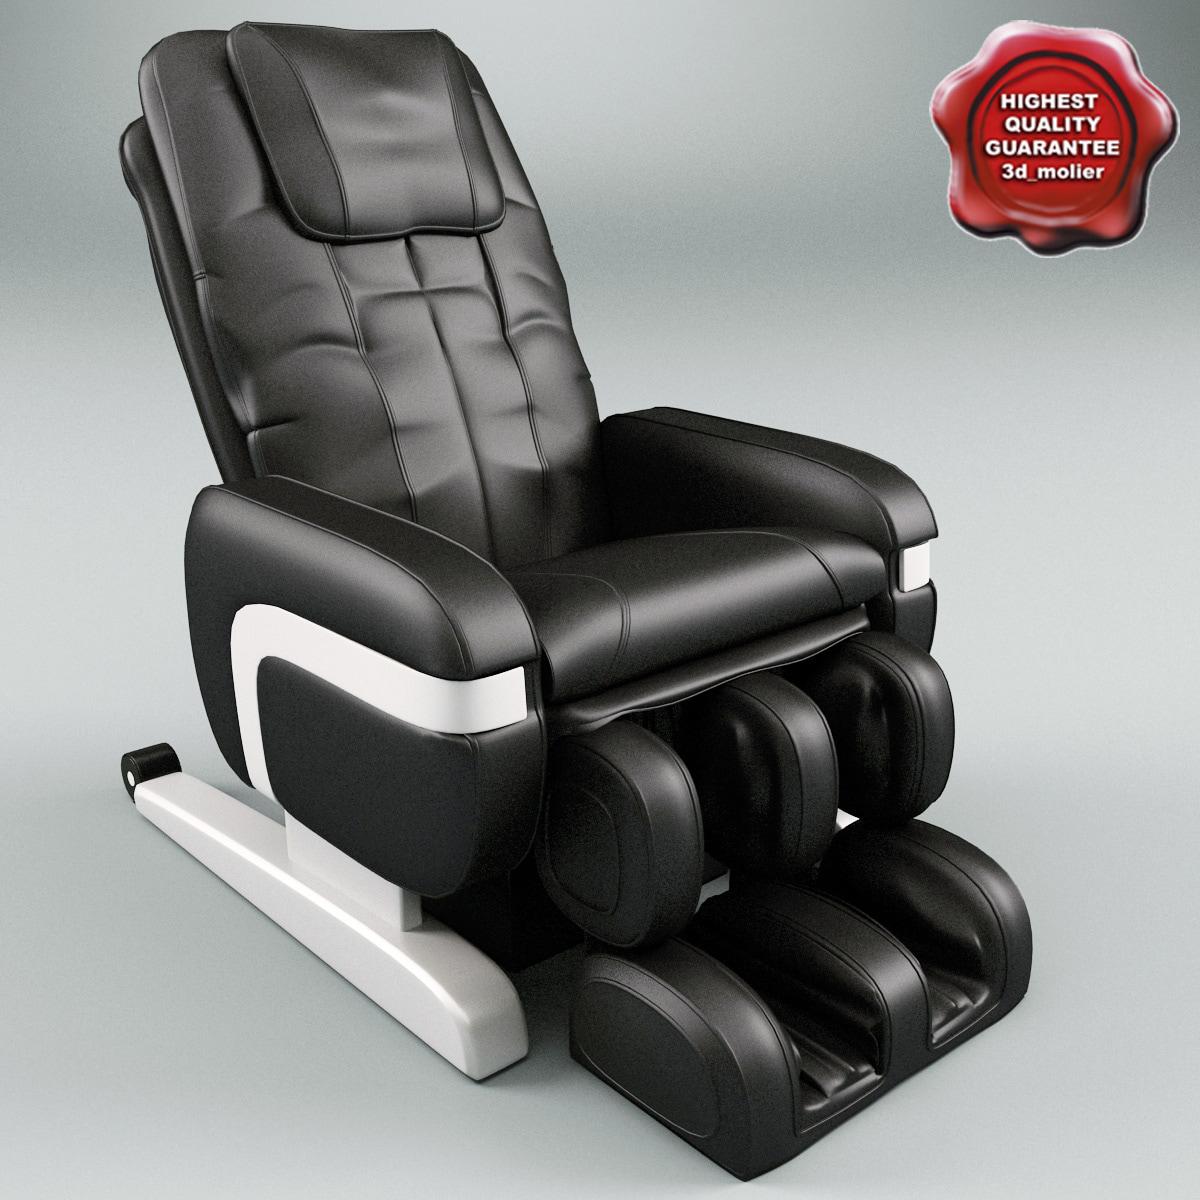 3d massage chair leopard print office bf 136 model